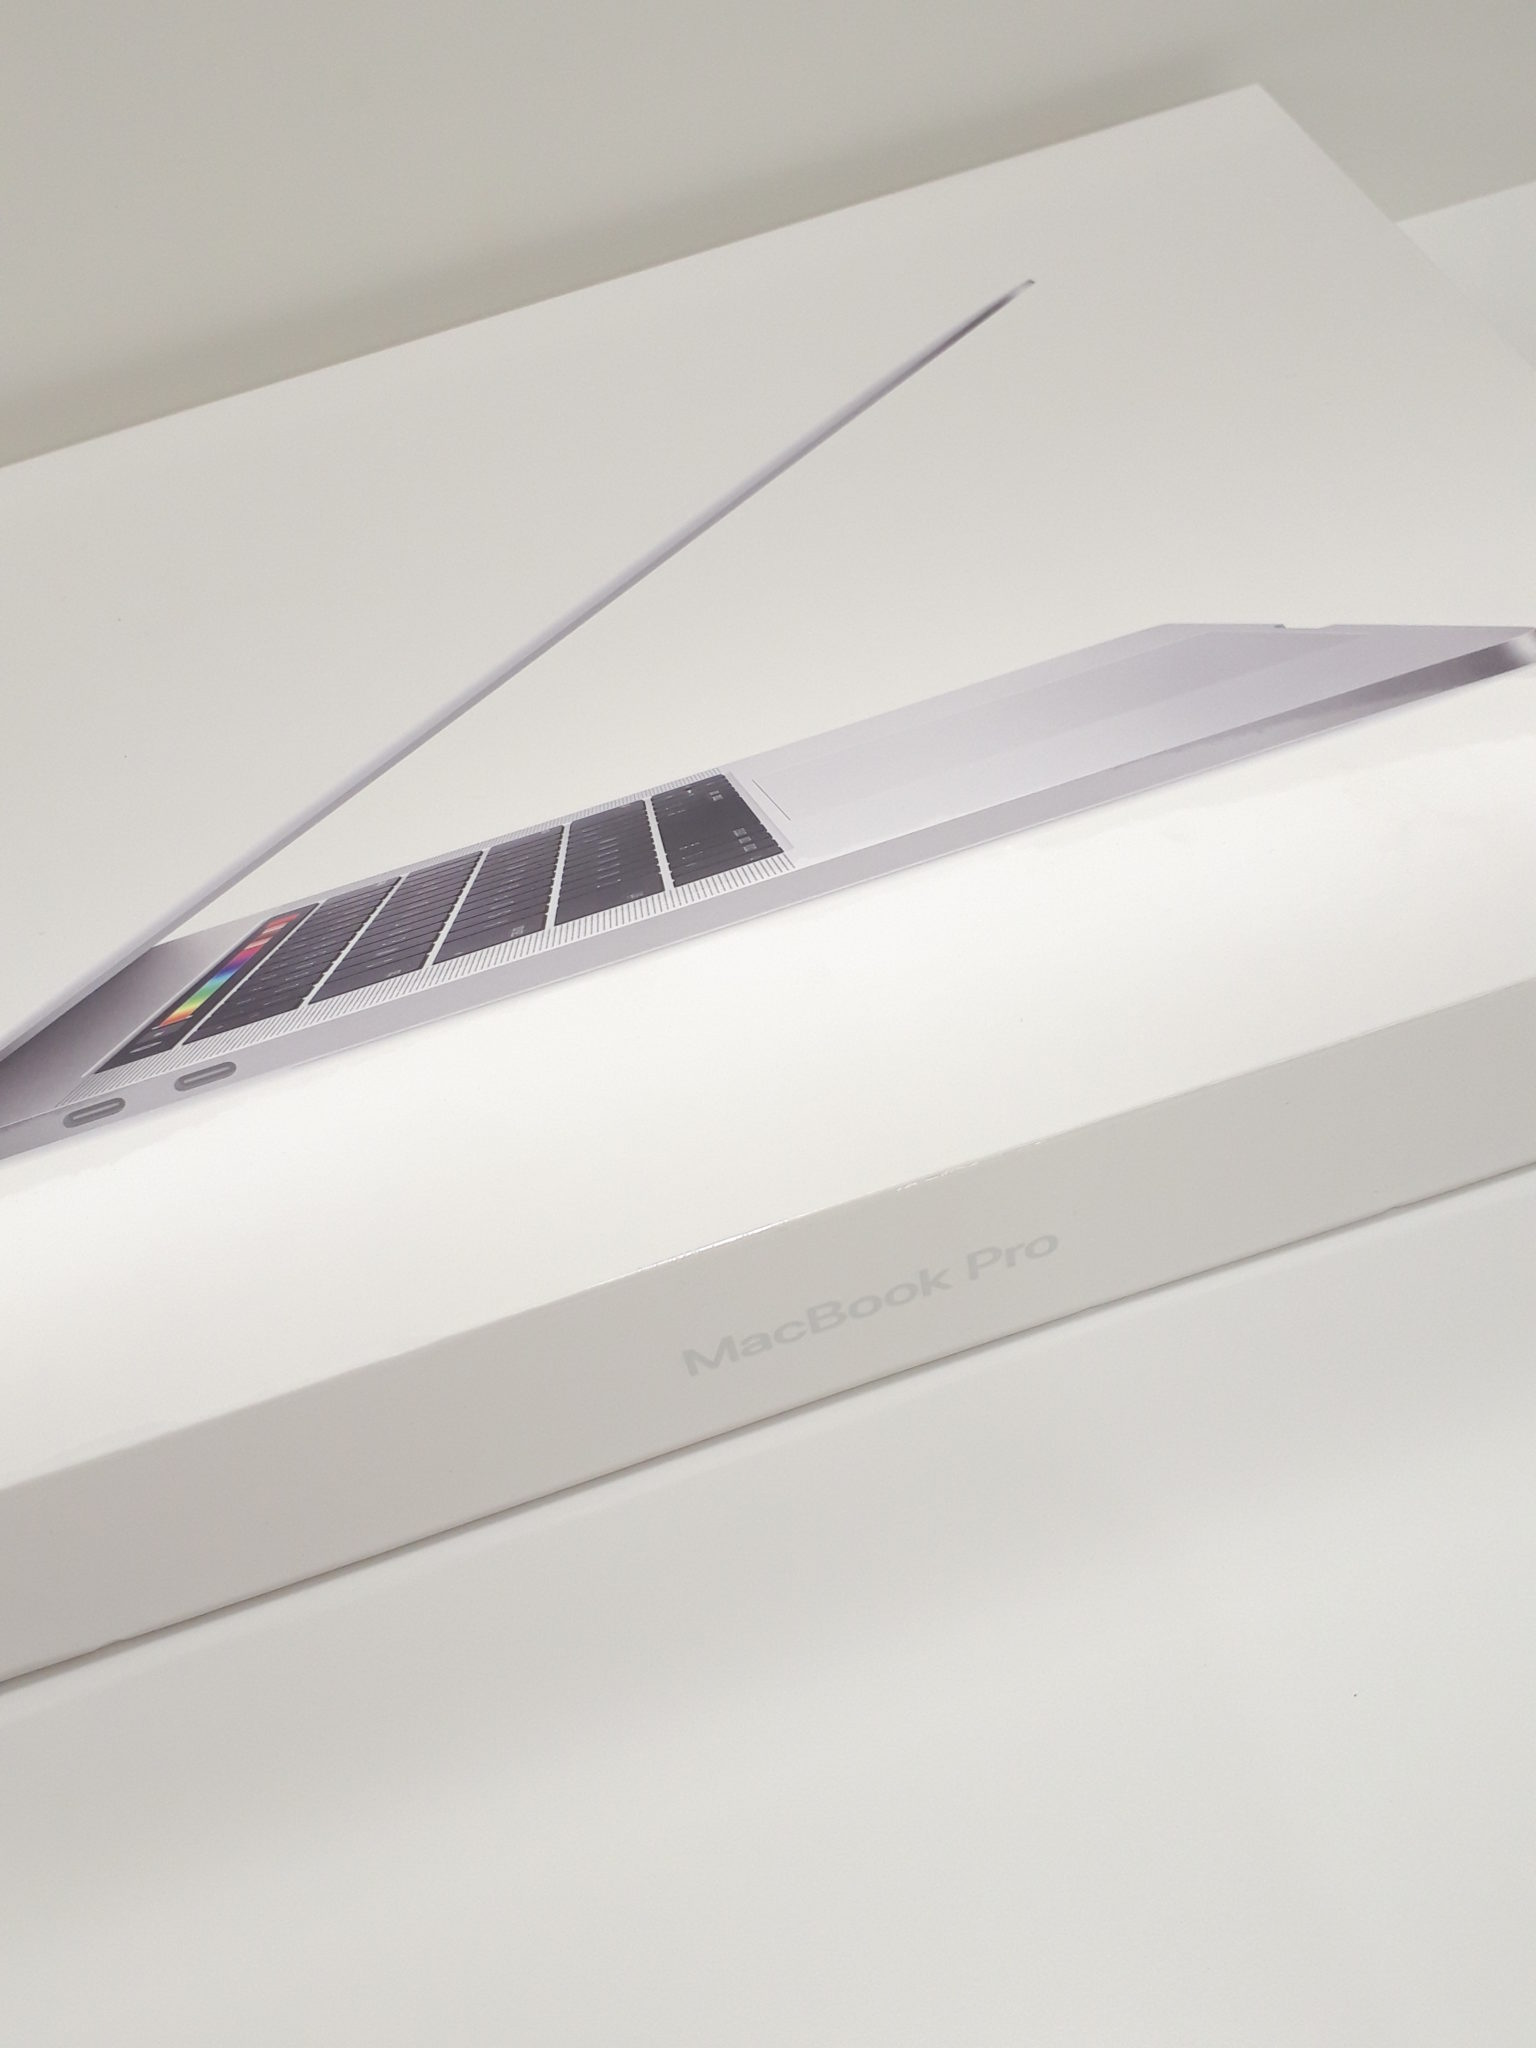 【Mac Book pro 15インチ 第9世代】を盛岡市のお客様よりお買取させて頂きました!